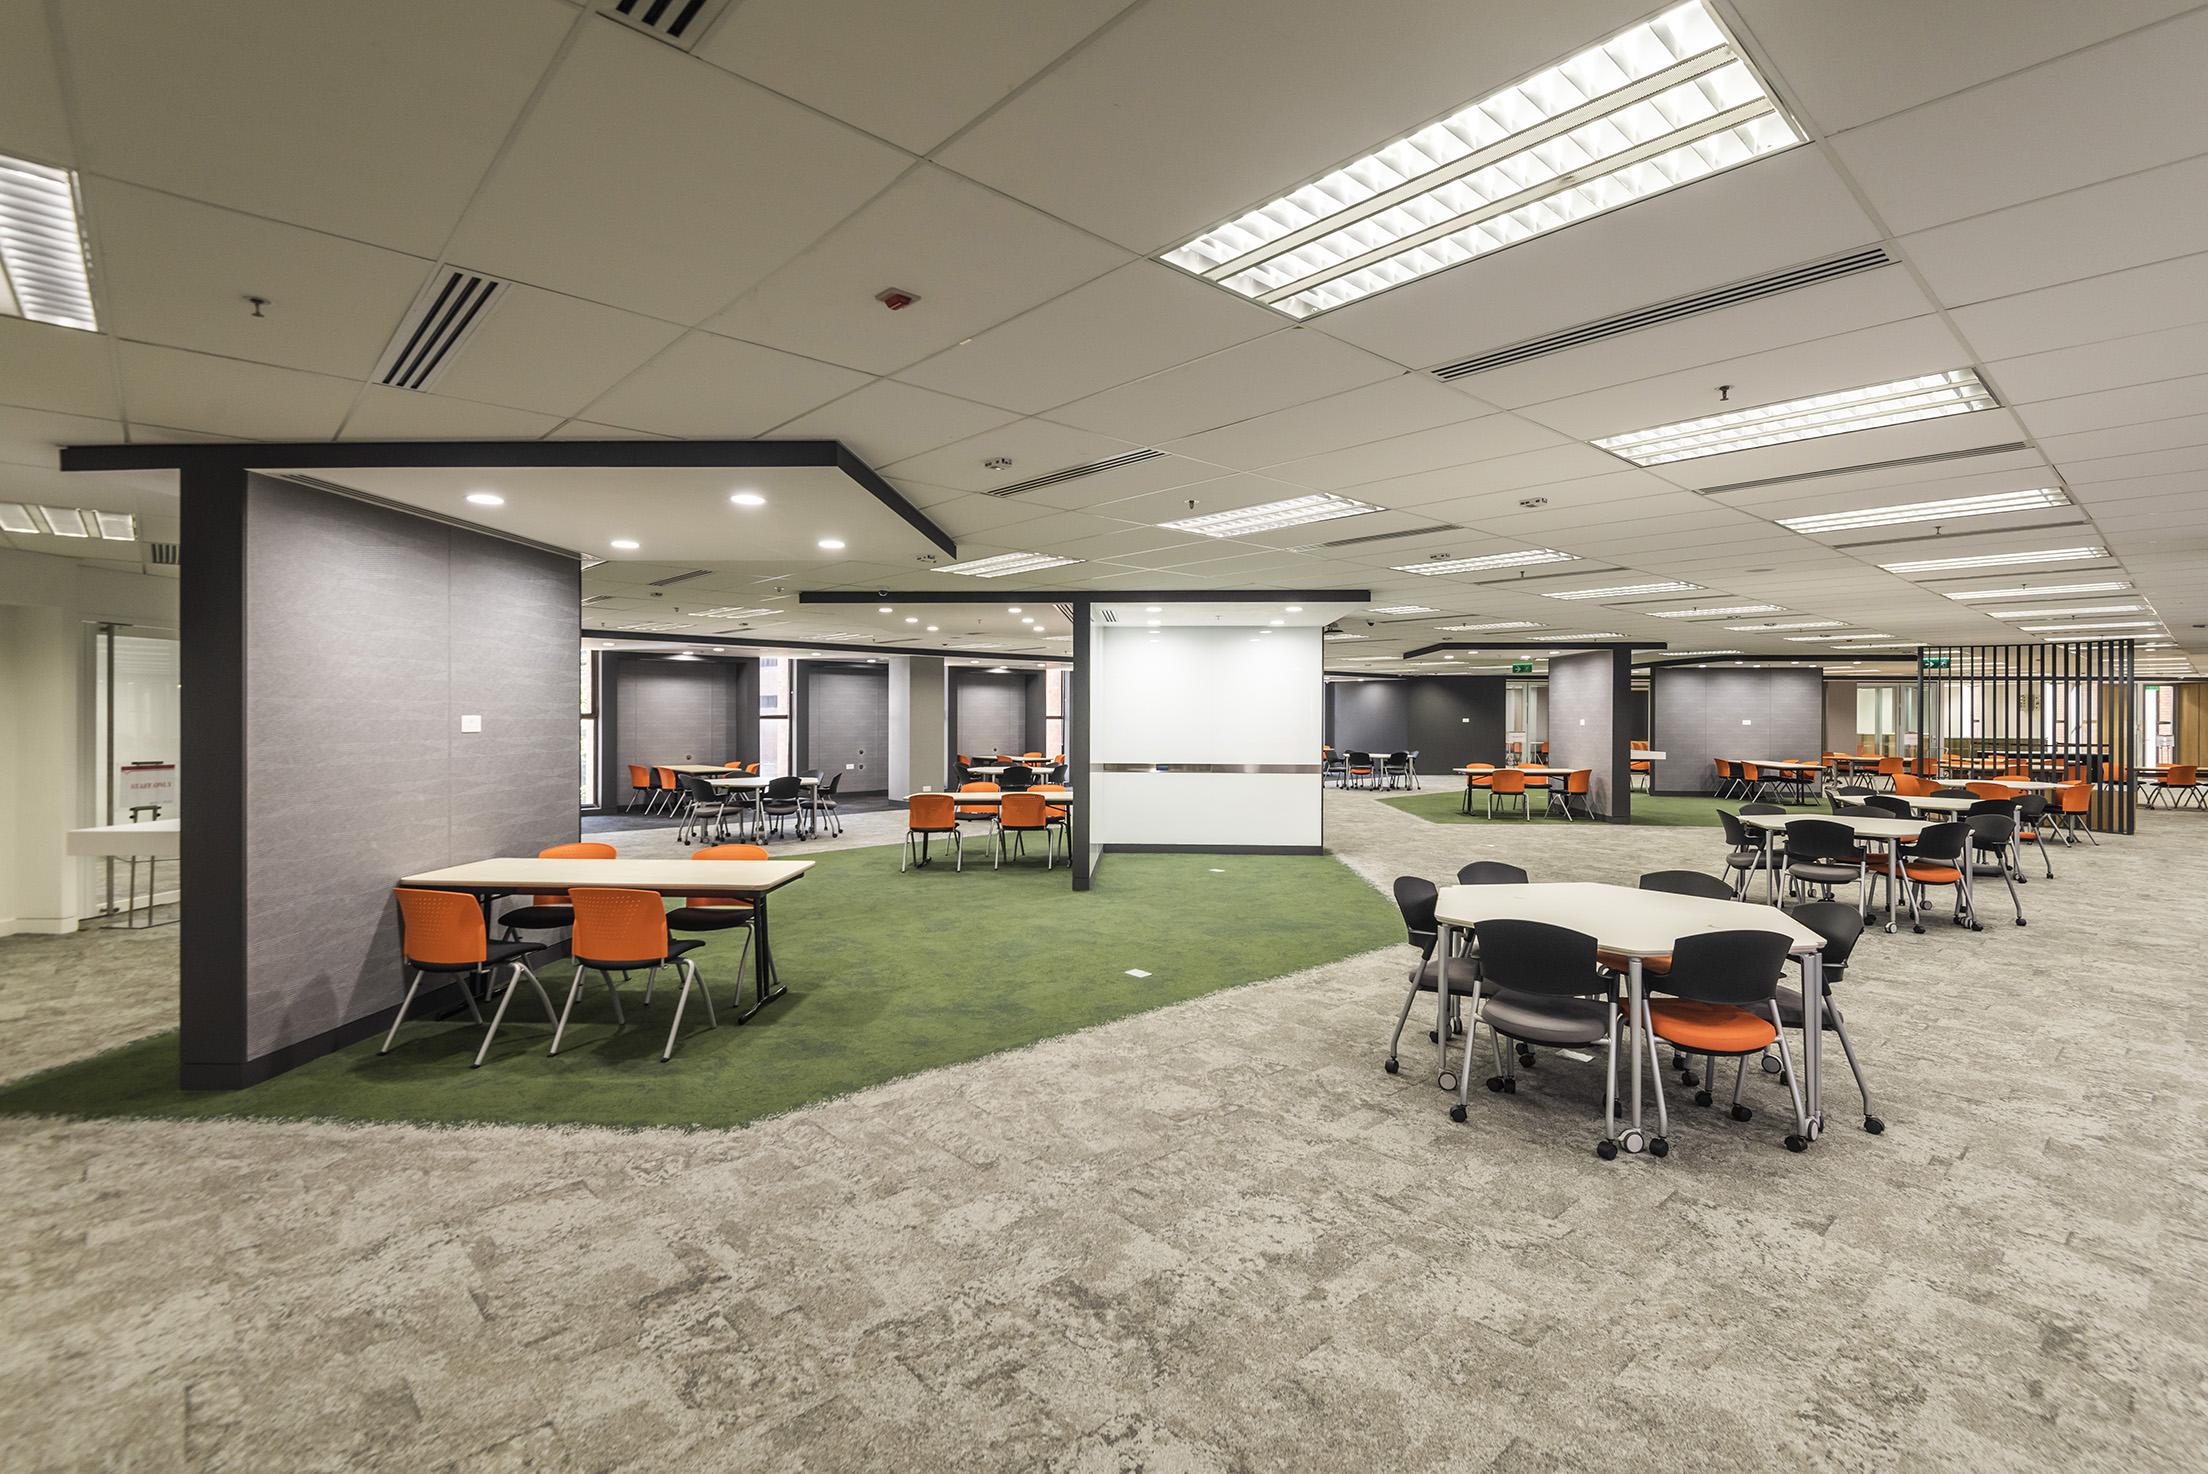 jeb_group-architecturalfinishes-echopanel-trapeze-poly-university-hk-02.jpg